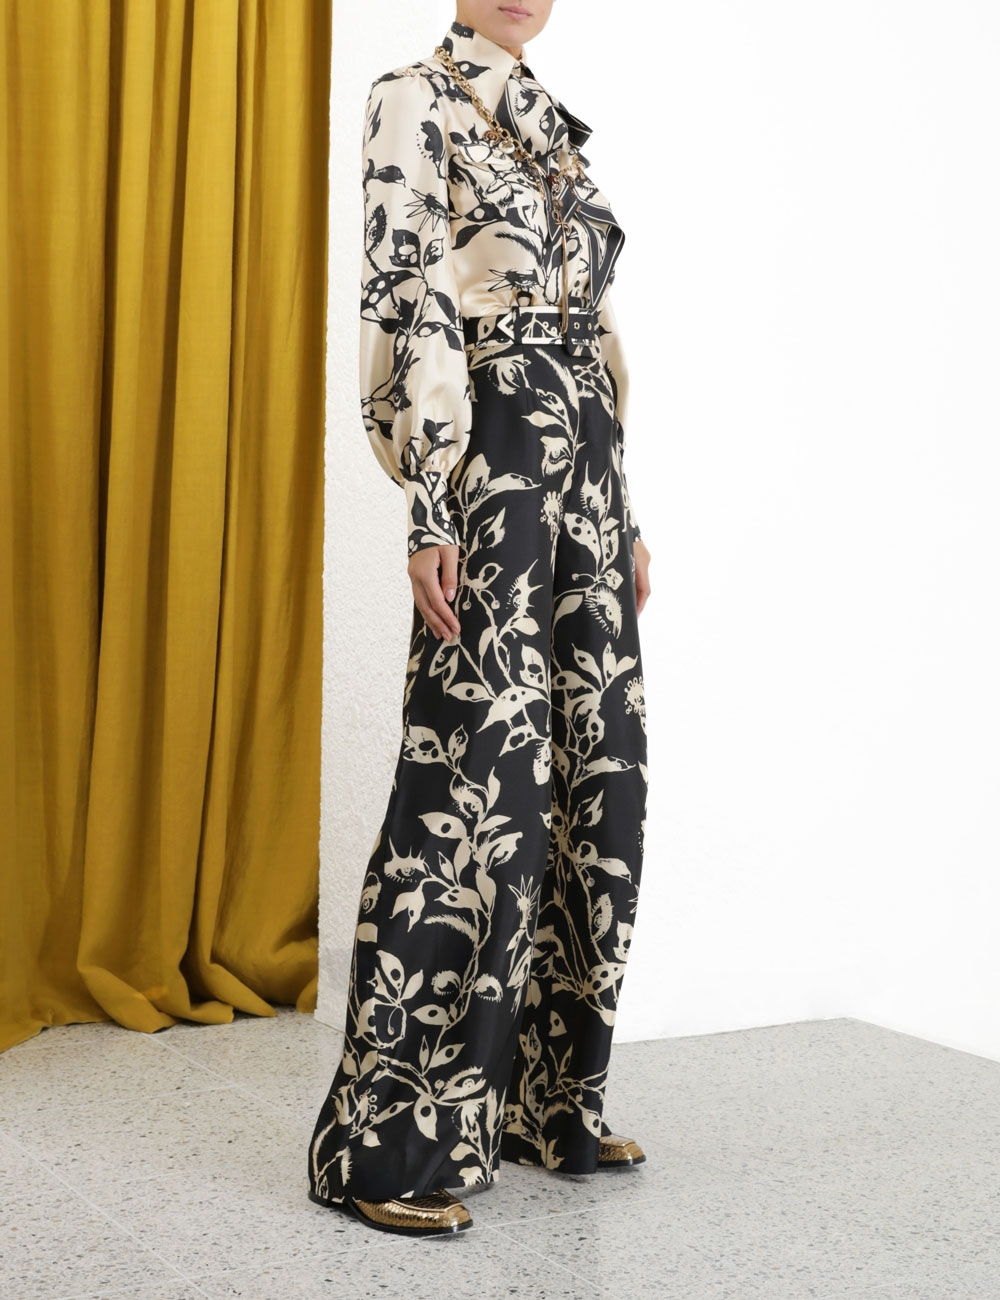 Ladybeetle Belted Pant